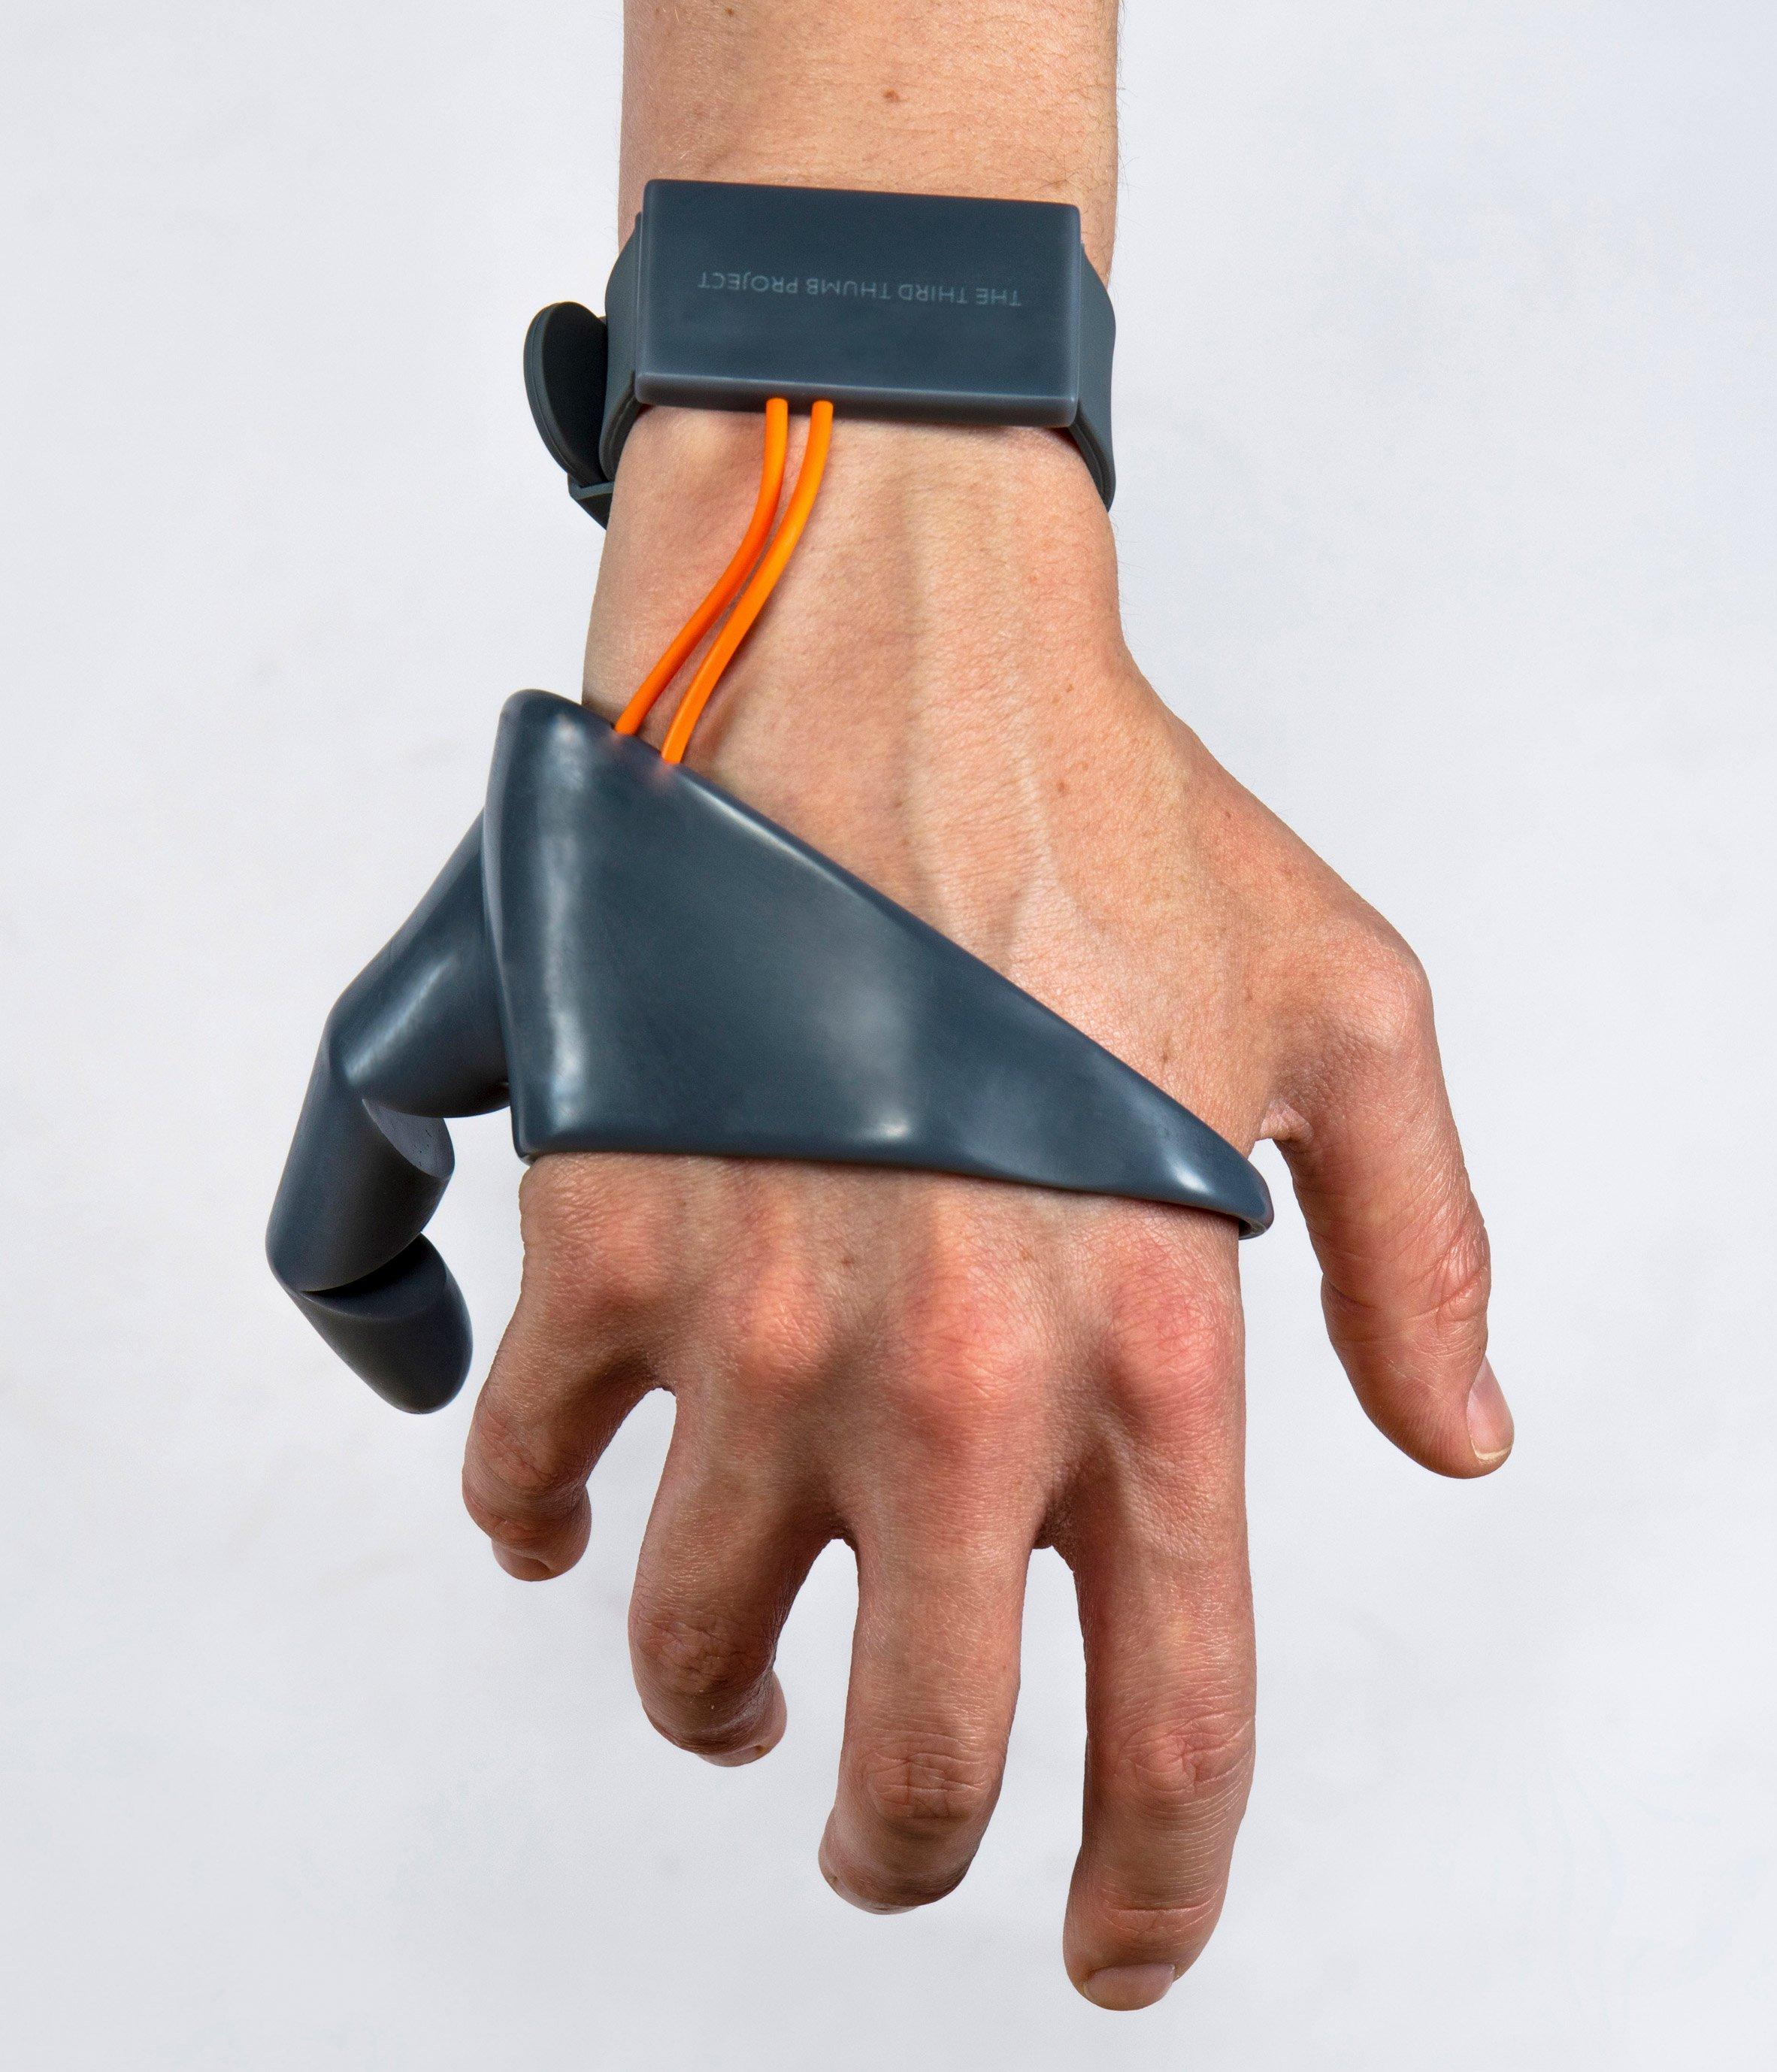 Картинки по запросу шестой палец протез